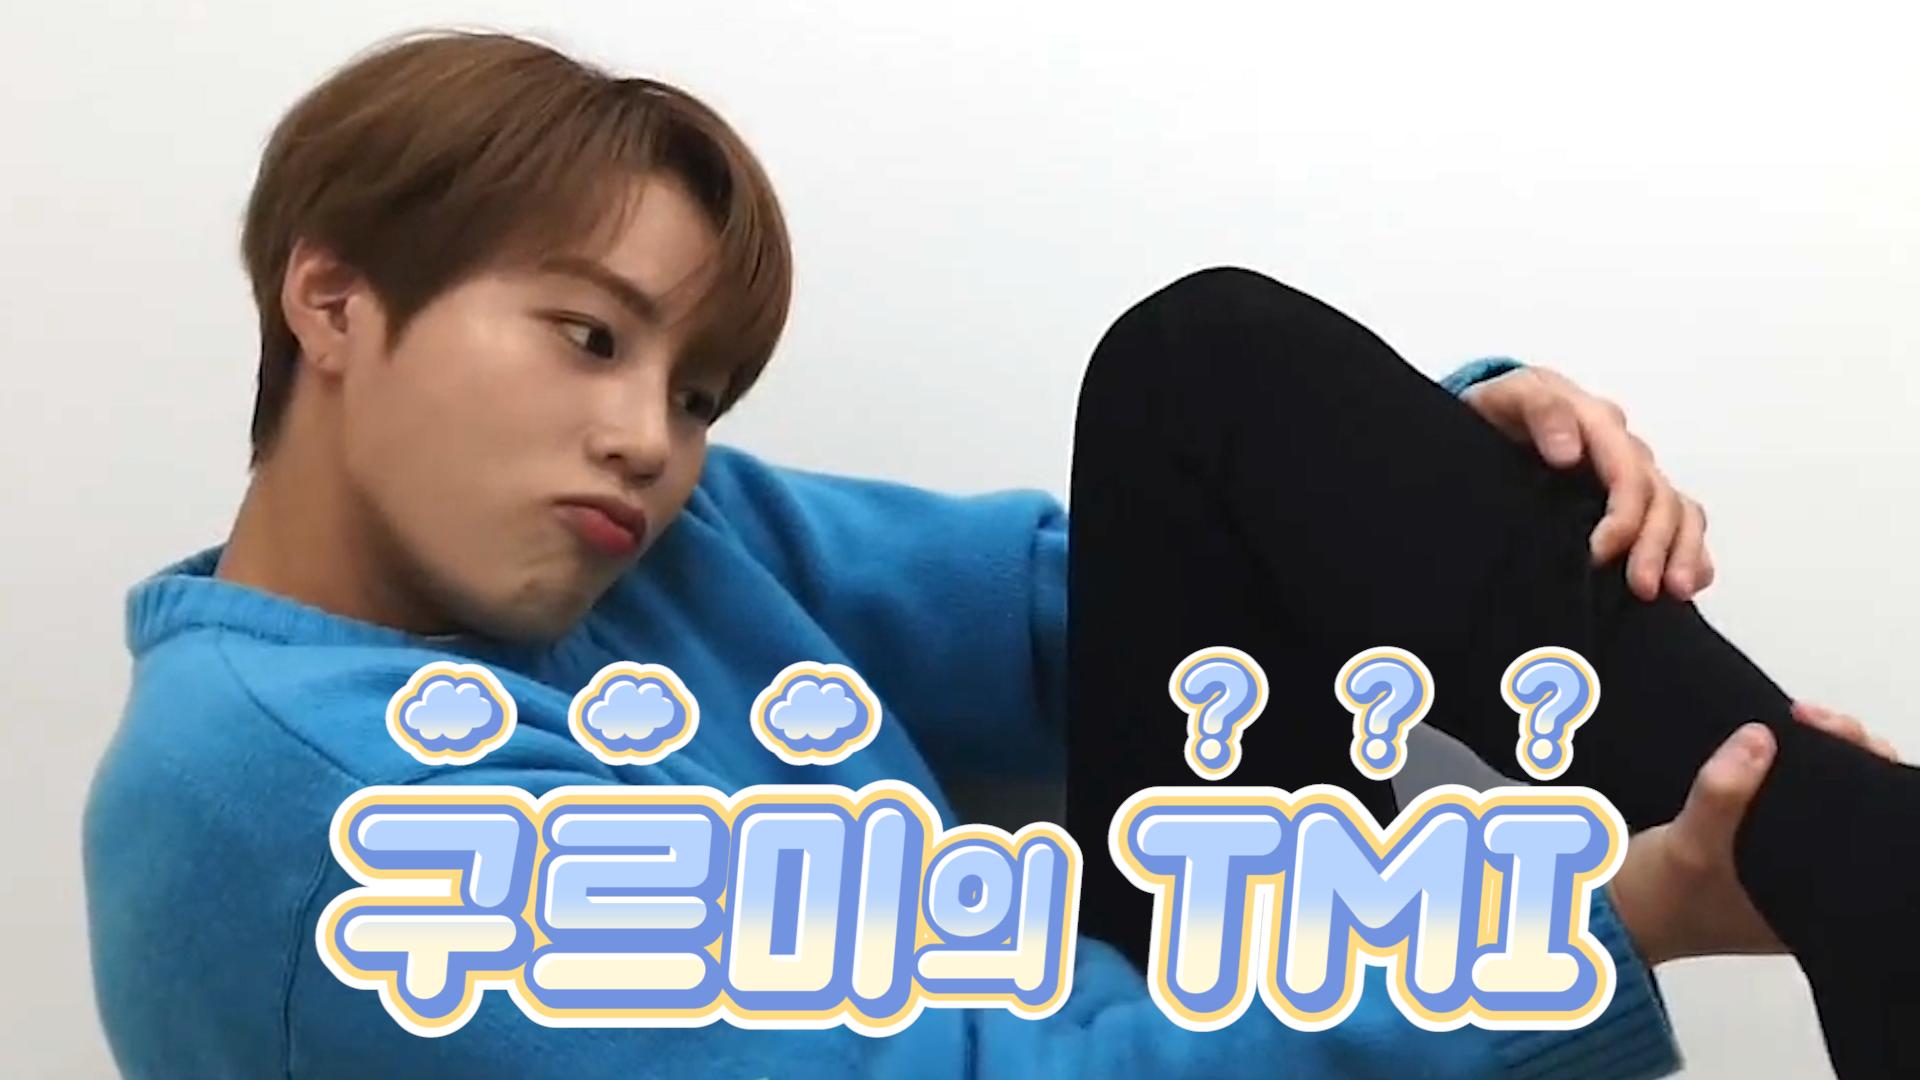 [HA SUNG WOON] 큐트력 체크타임이라 읽는 구르미의 투 머취 깜찍말랑 인포메이션💕☑️ (SungWoon's TMI Time)